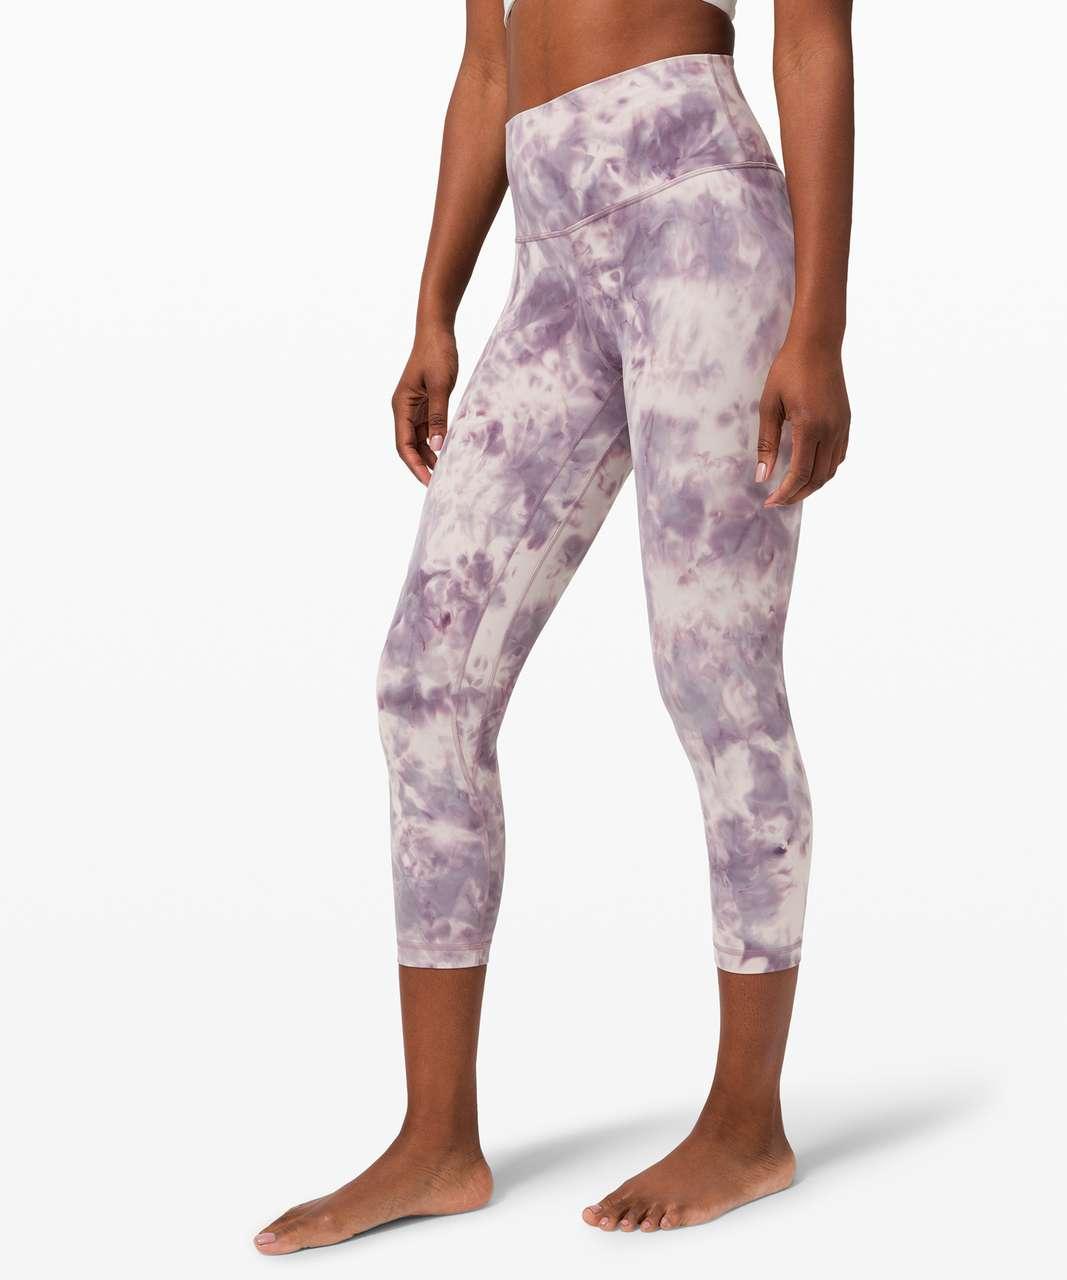 "Lululemon Align Crop 21"" *Diamond Dye - Diamond Dye Pink Bliss Graphite Purple"